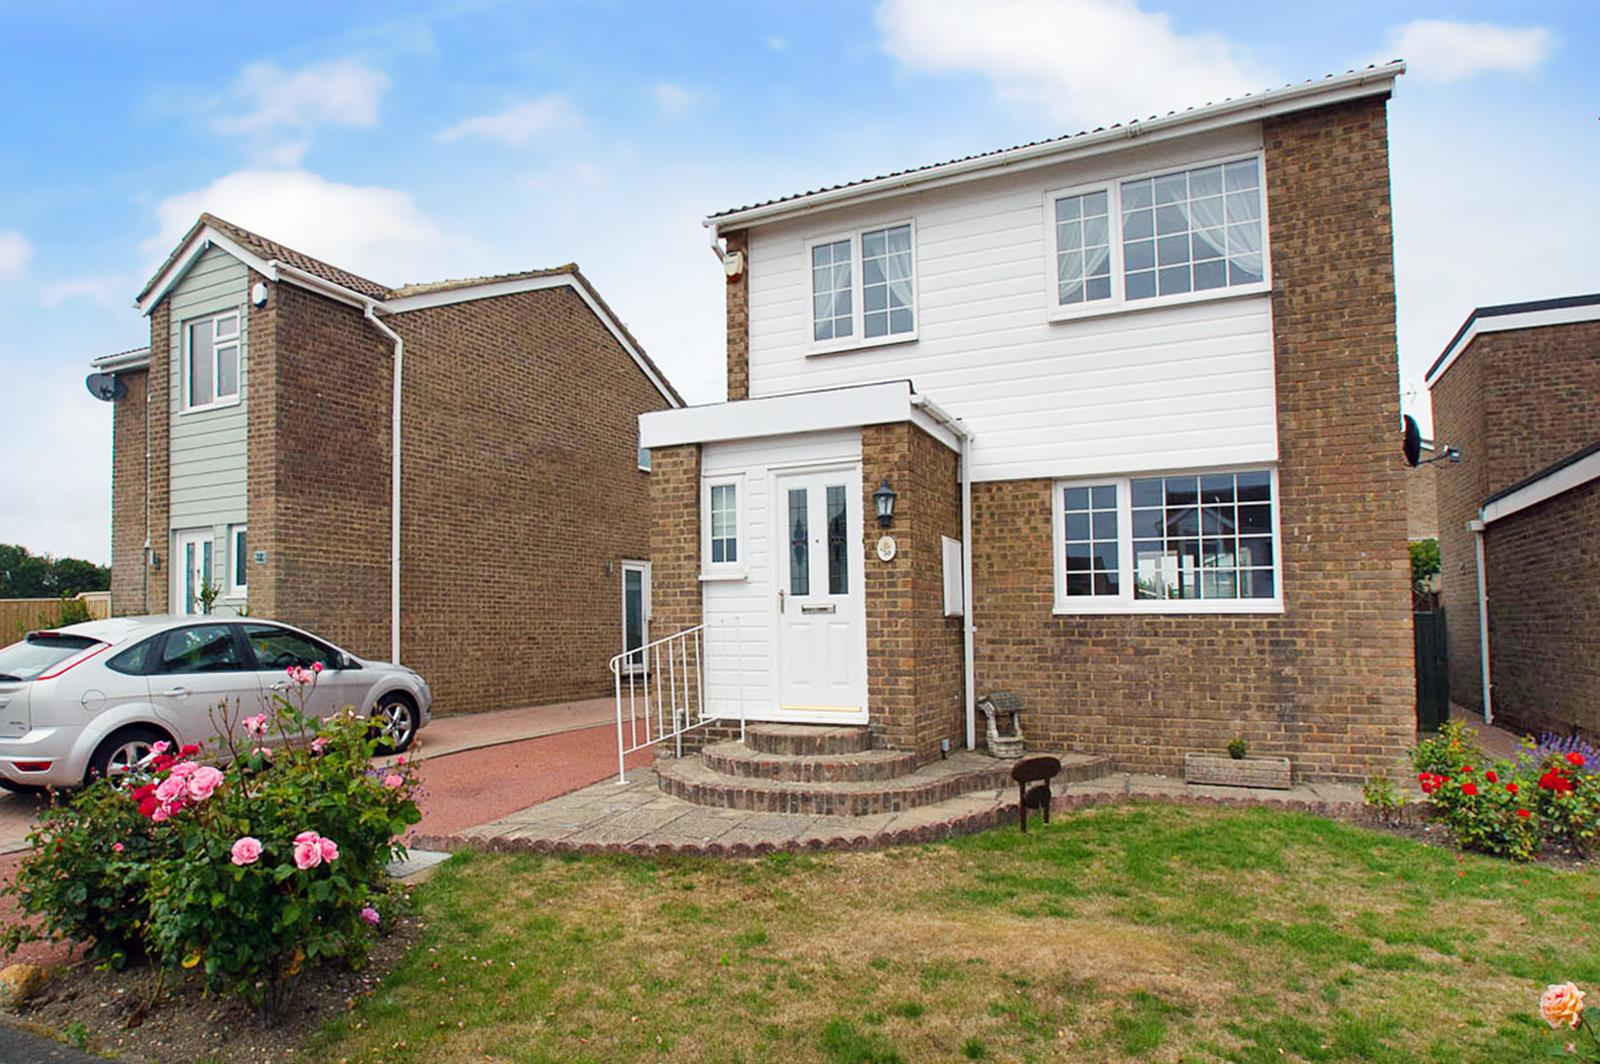 3 Bedrooms Property for sale in Badlesmere Road, Eastbourne